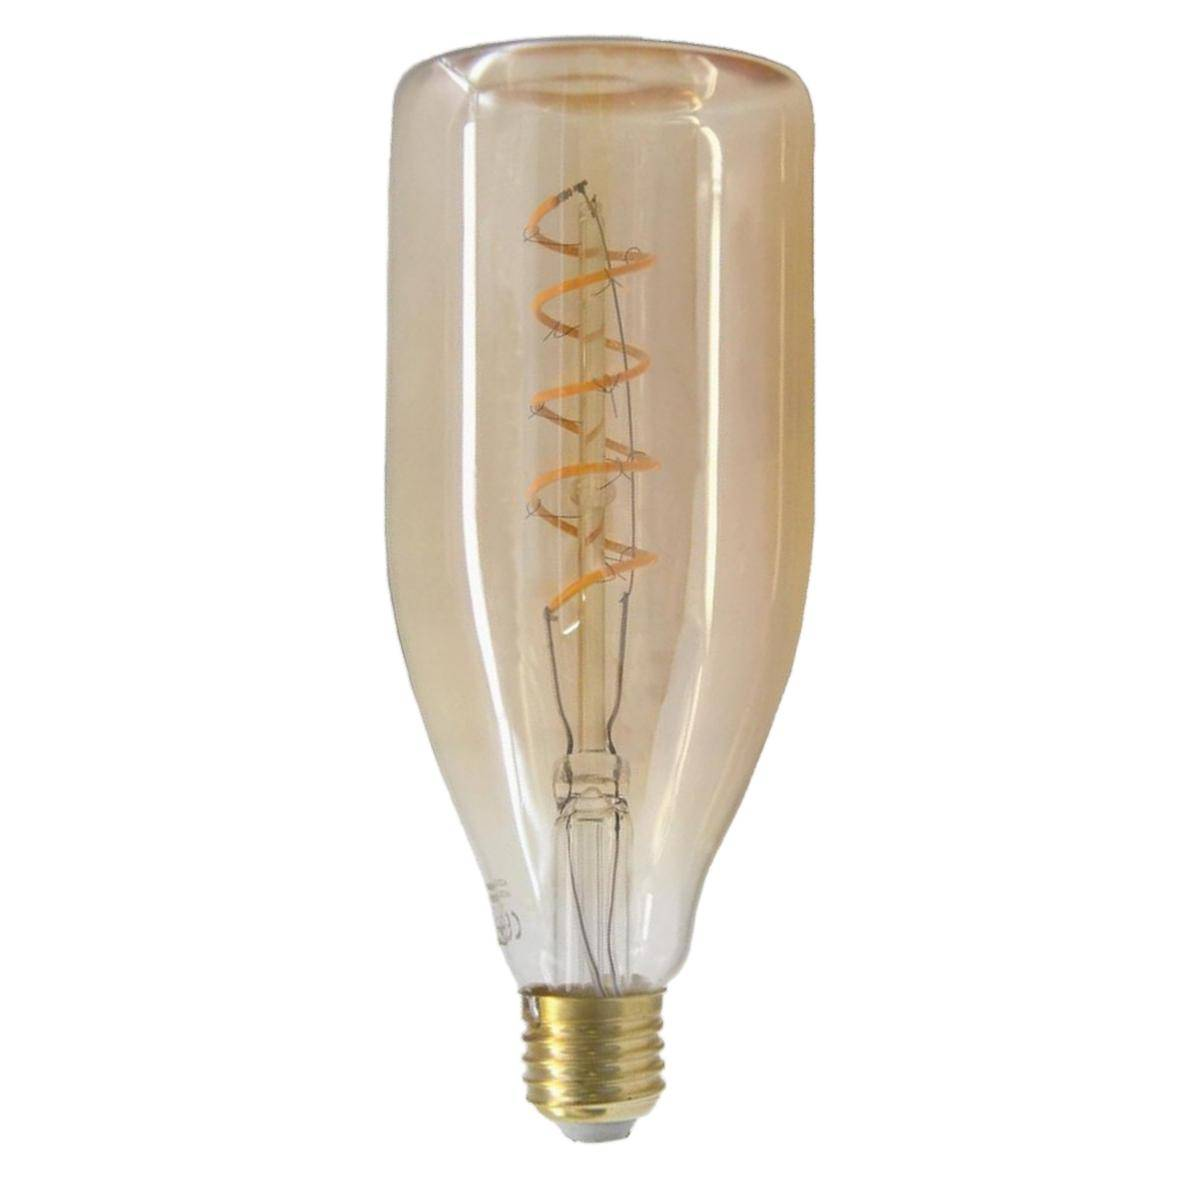 SILAMP Ampoule LED E27 Filament Dimmable 4W Bouteille - Blanc Chaud 2300K - 3500K